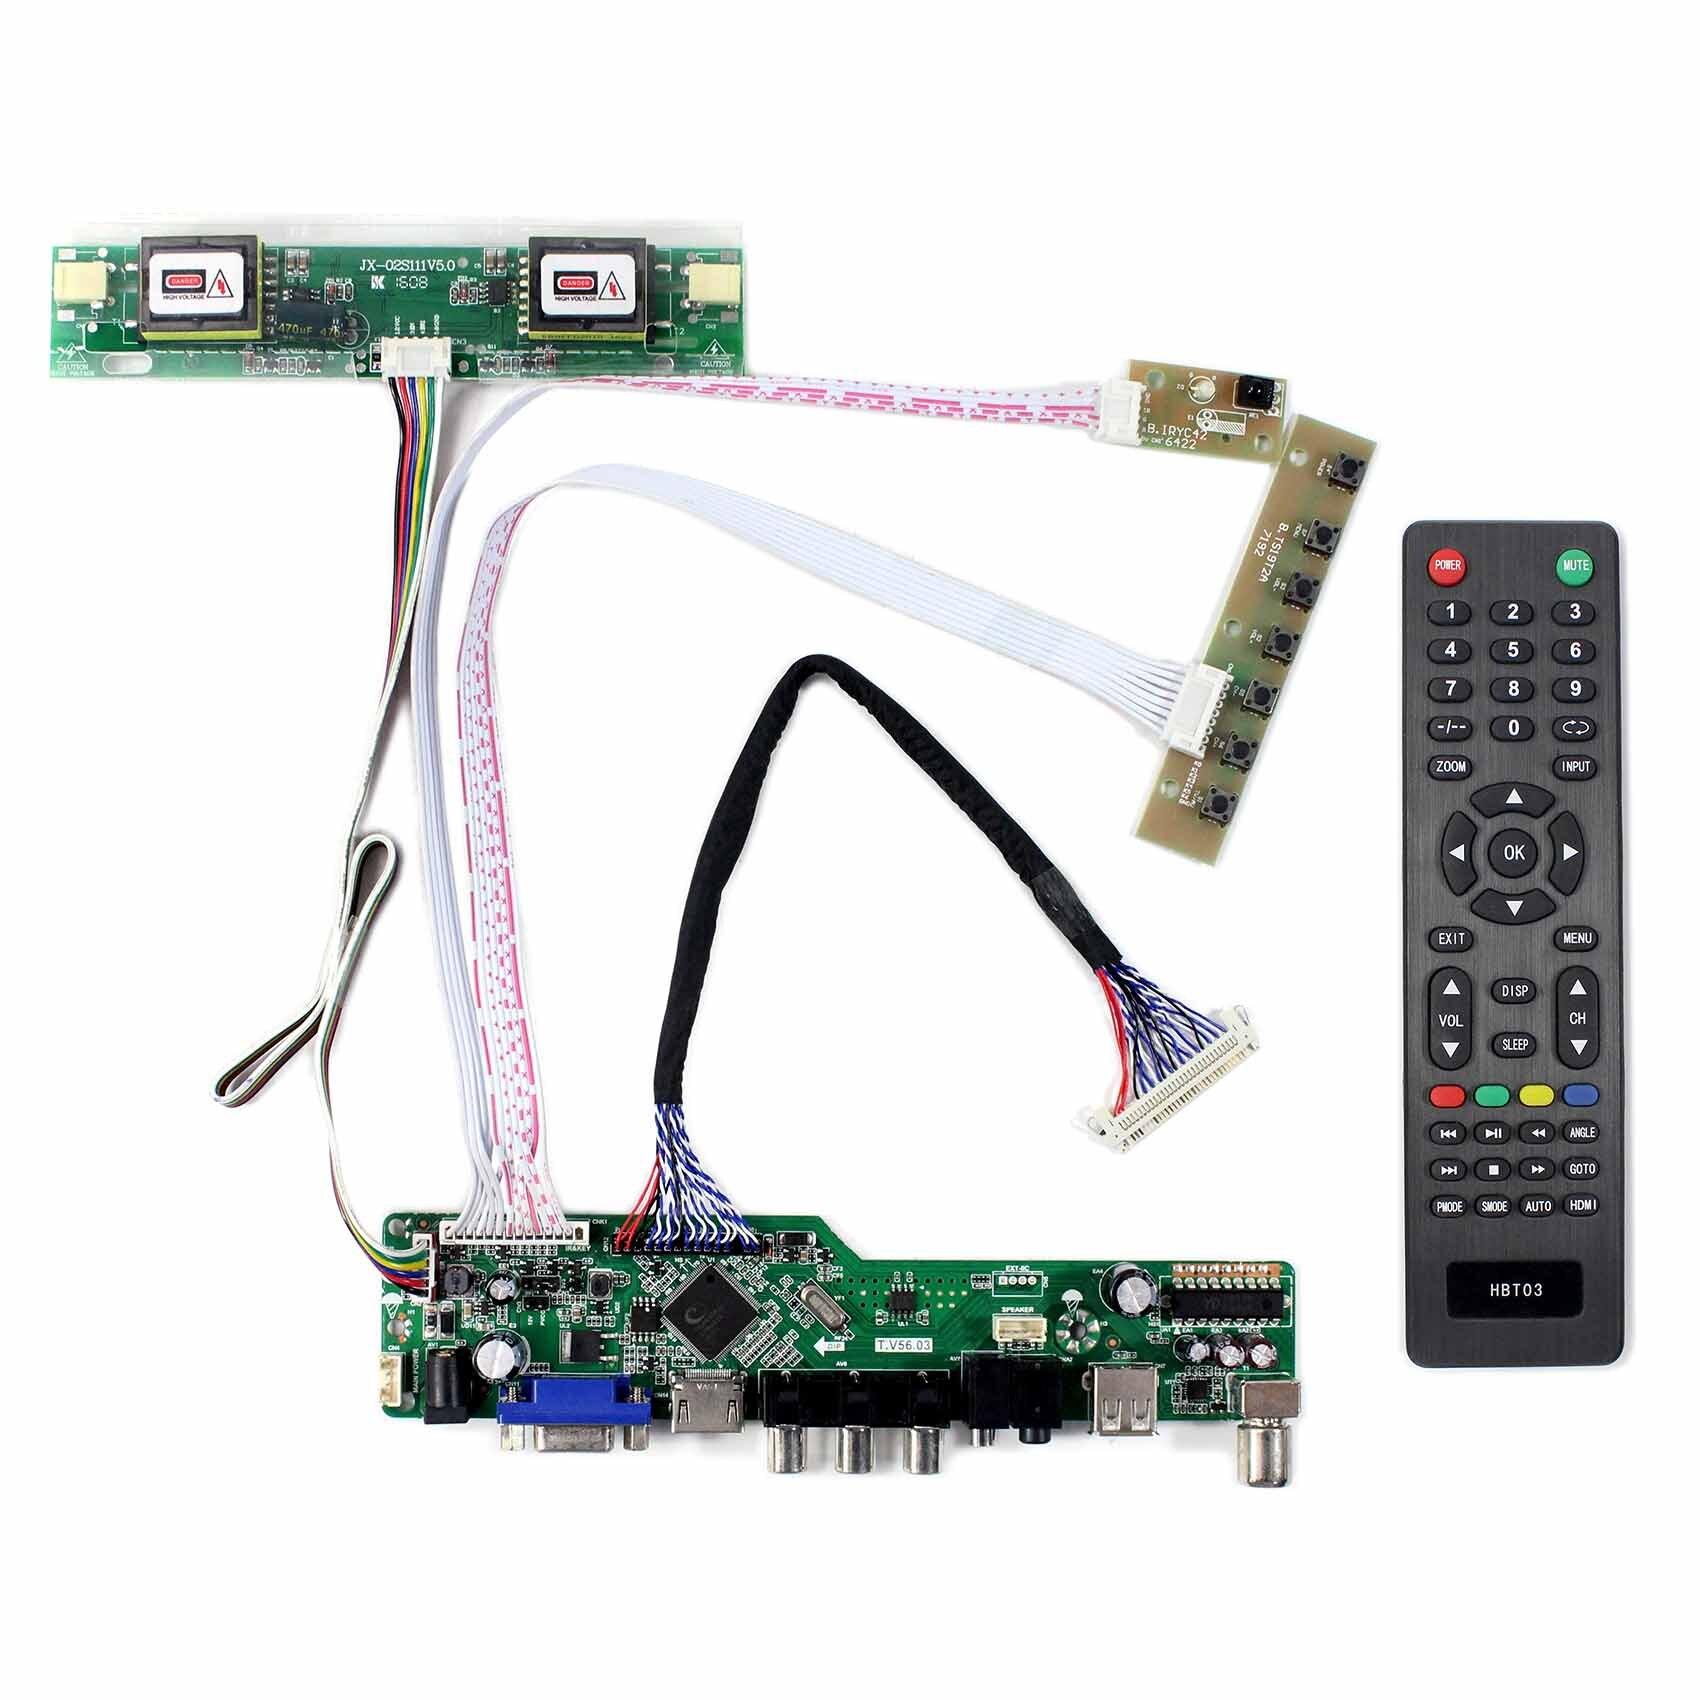 HD MI VGA AV USB RF LCD تحكم مجلس التلفزيون مجلس ل 17 بوصة 1280x1024 M170ETN01.0 LTM170ET01 M170EG01 VF/VG/VH LM170E03